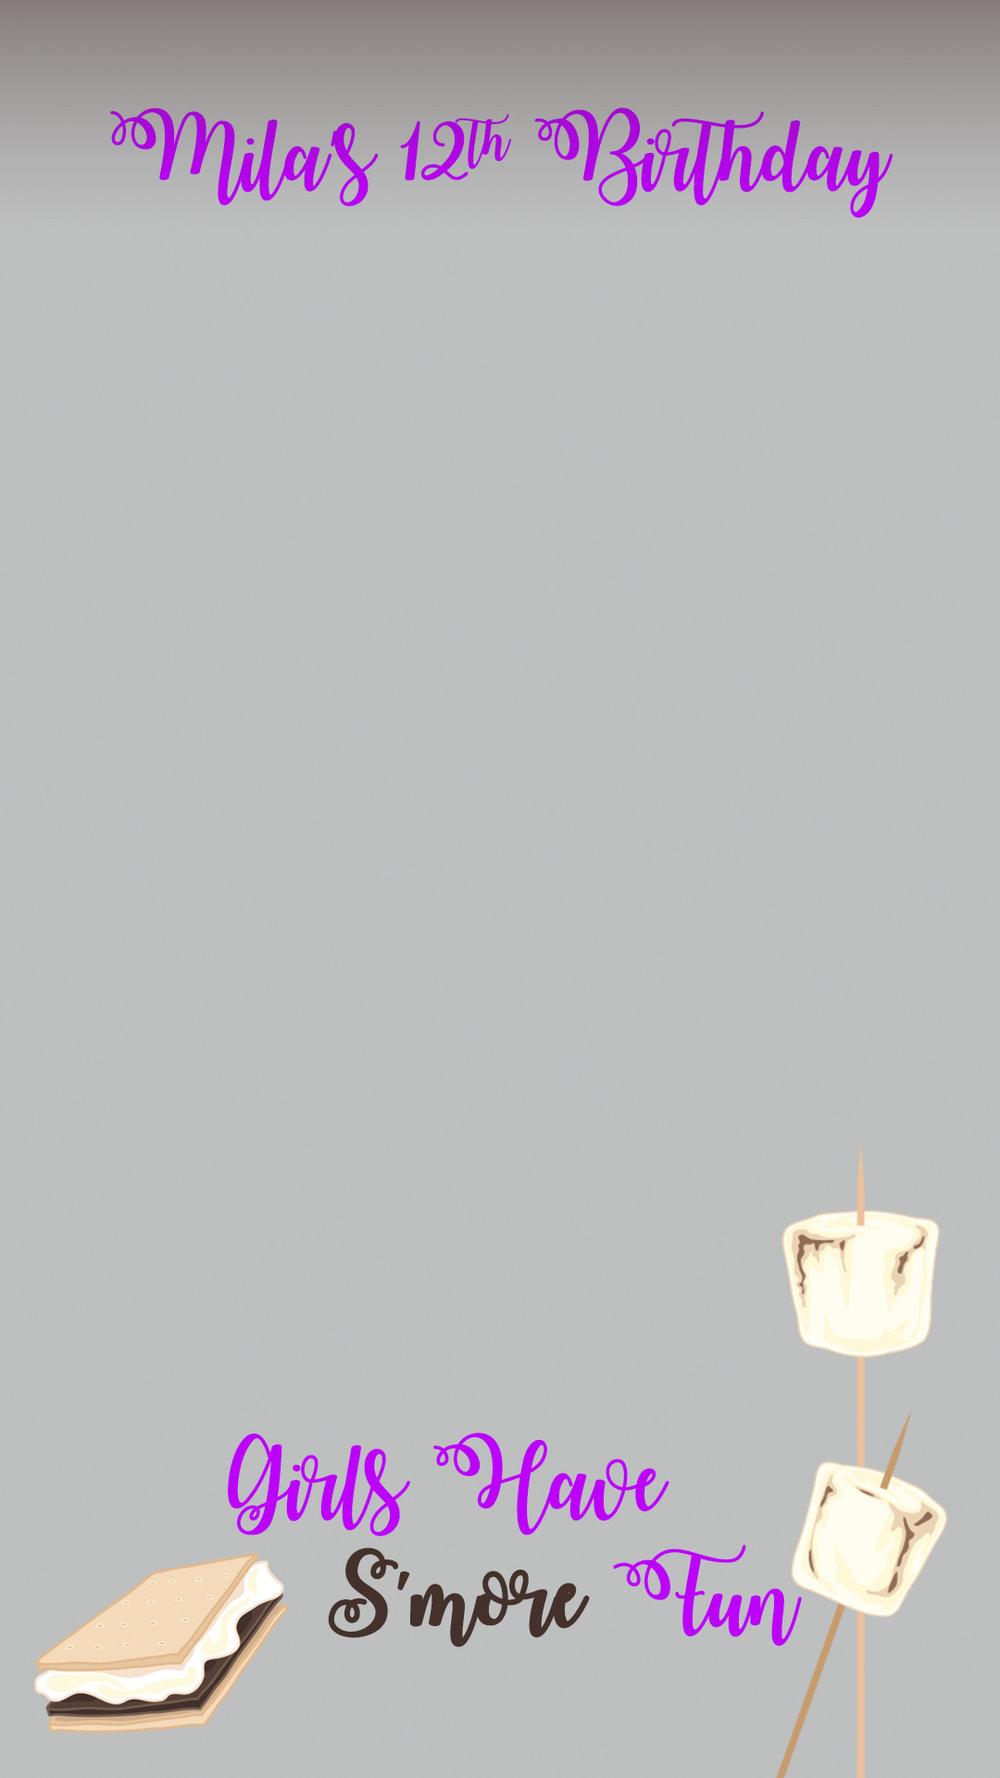 02.17.18TamikaTaylor.jpg